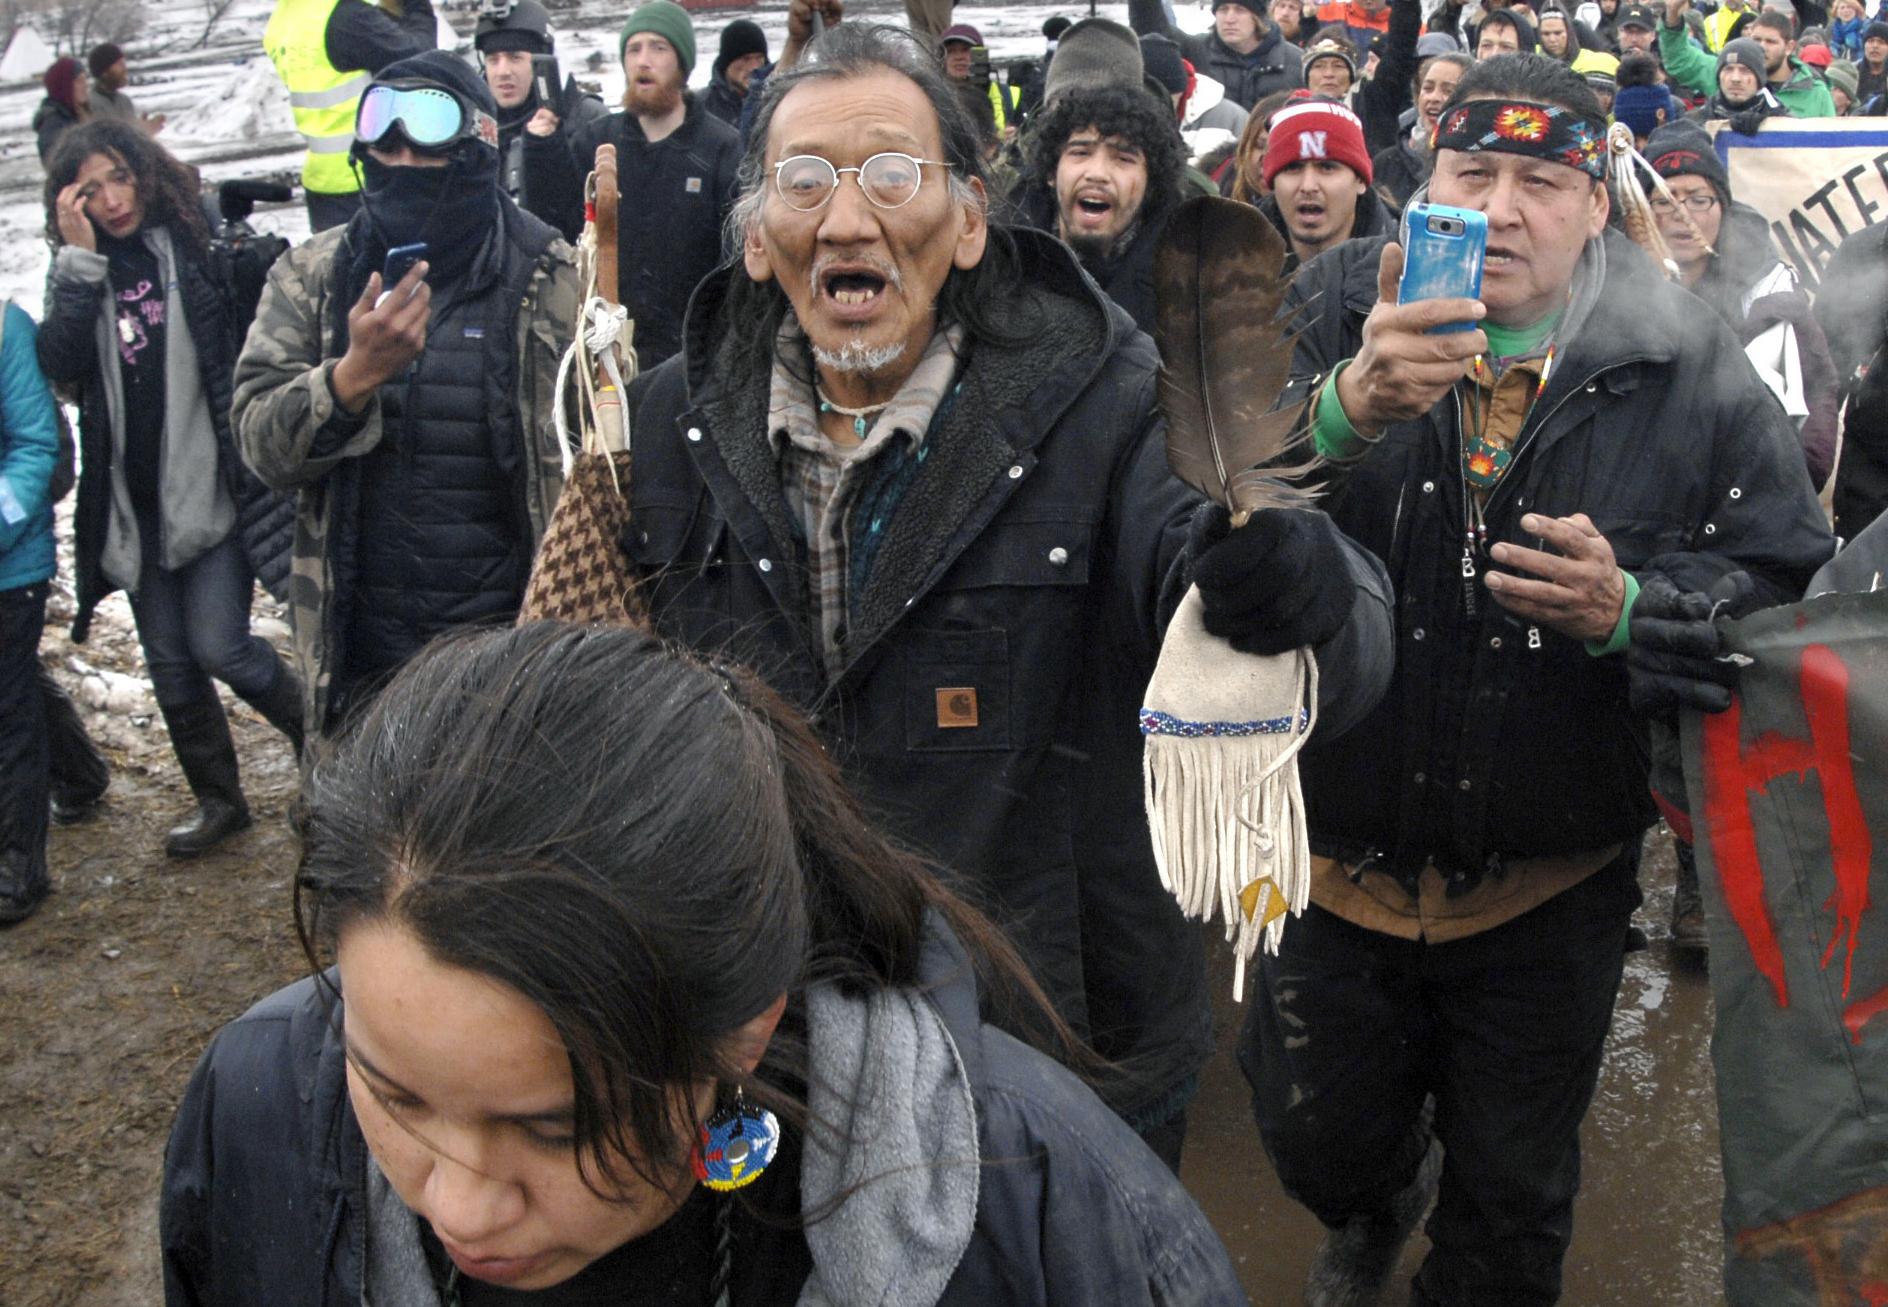 Native_American_March_Videos_11847-159532.jpg17394689